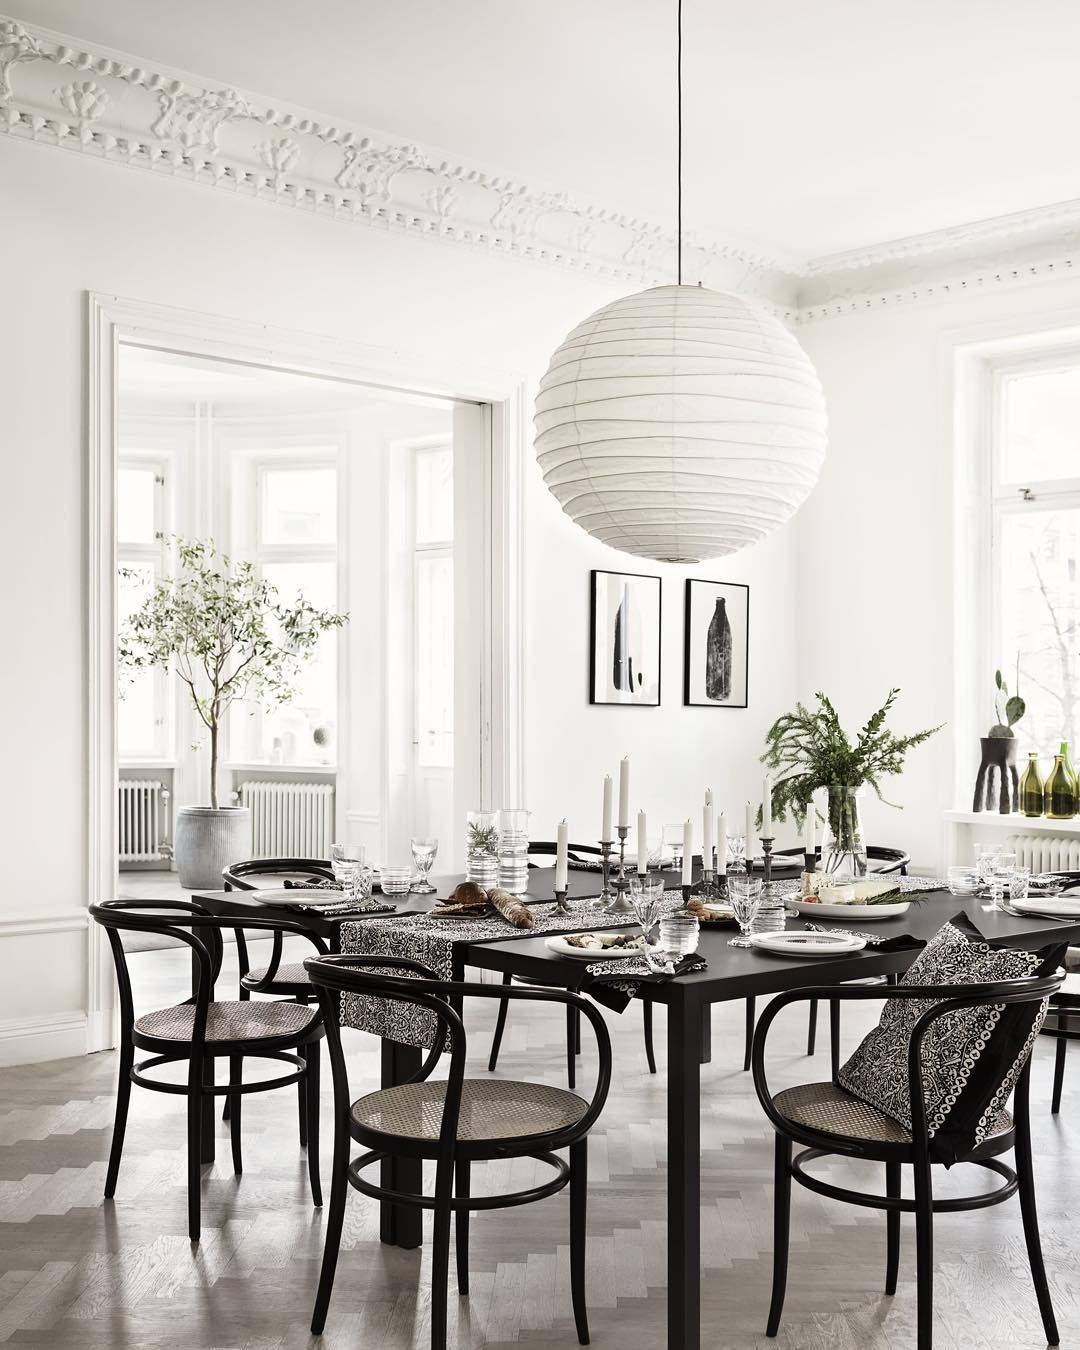 """What is better than an evening in good company // #marimekko #marimekkoaw15 // Table was set with Oiva plates and Sukat makkaralla glasses"""